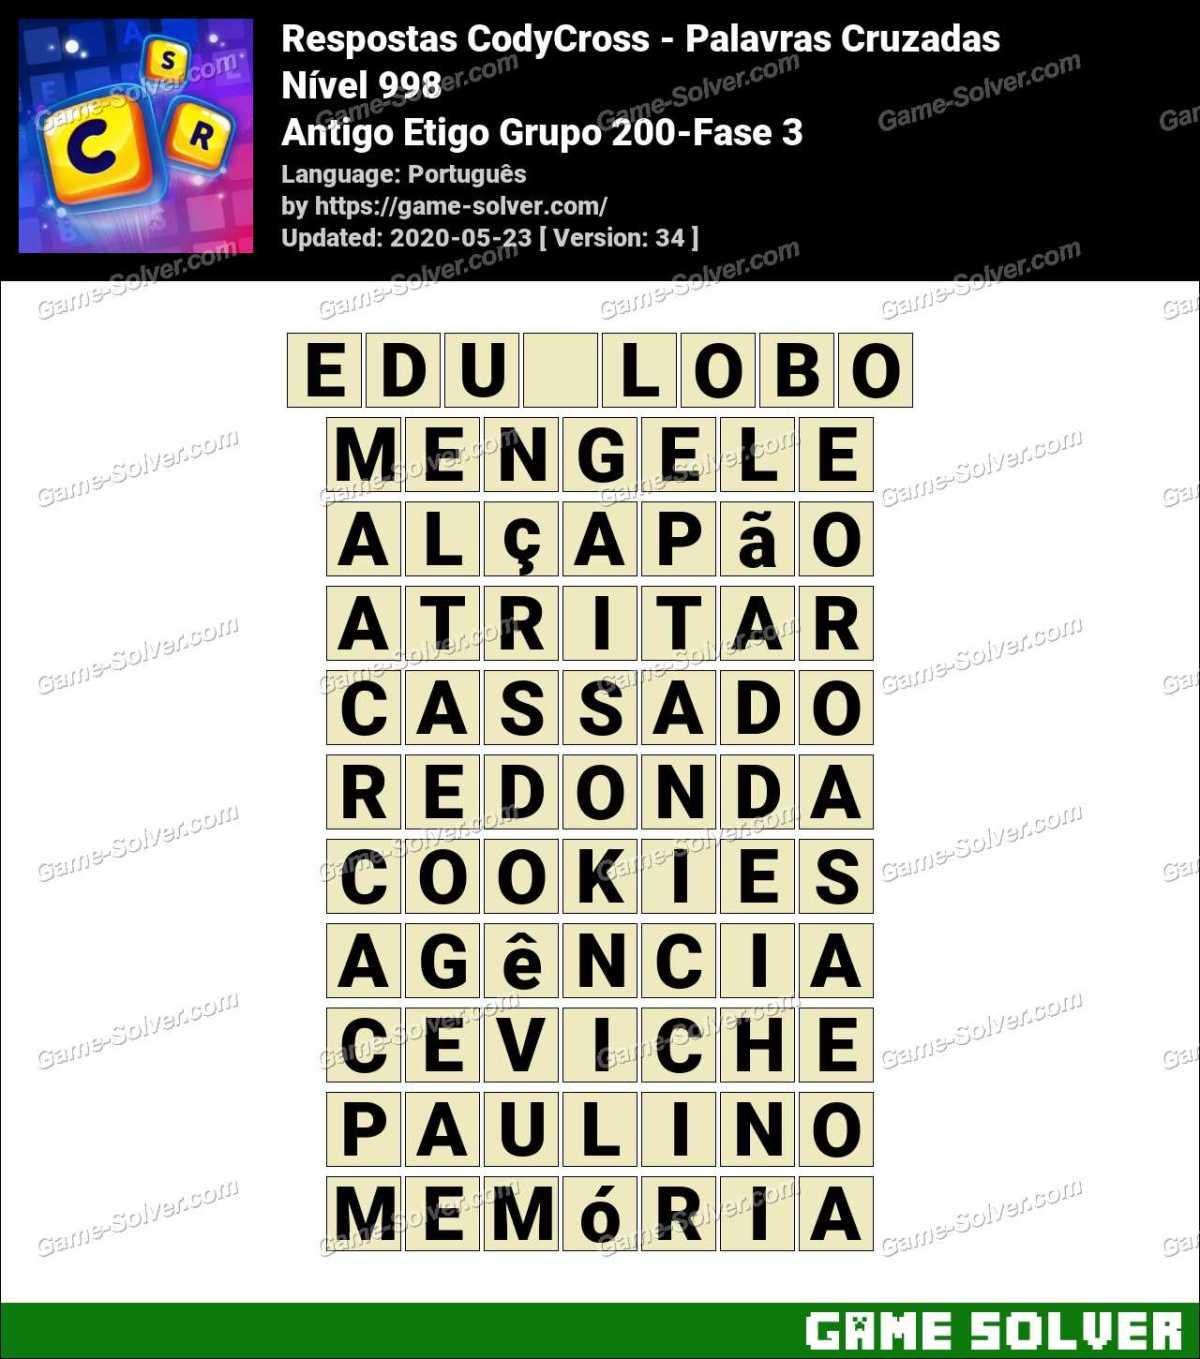 Respostas CodyCross Antigo Etigo Grupo 200-Fase 3